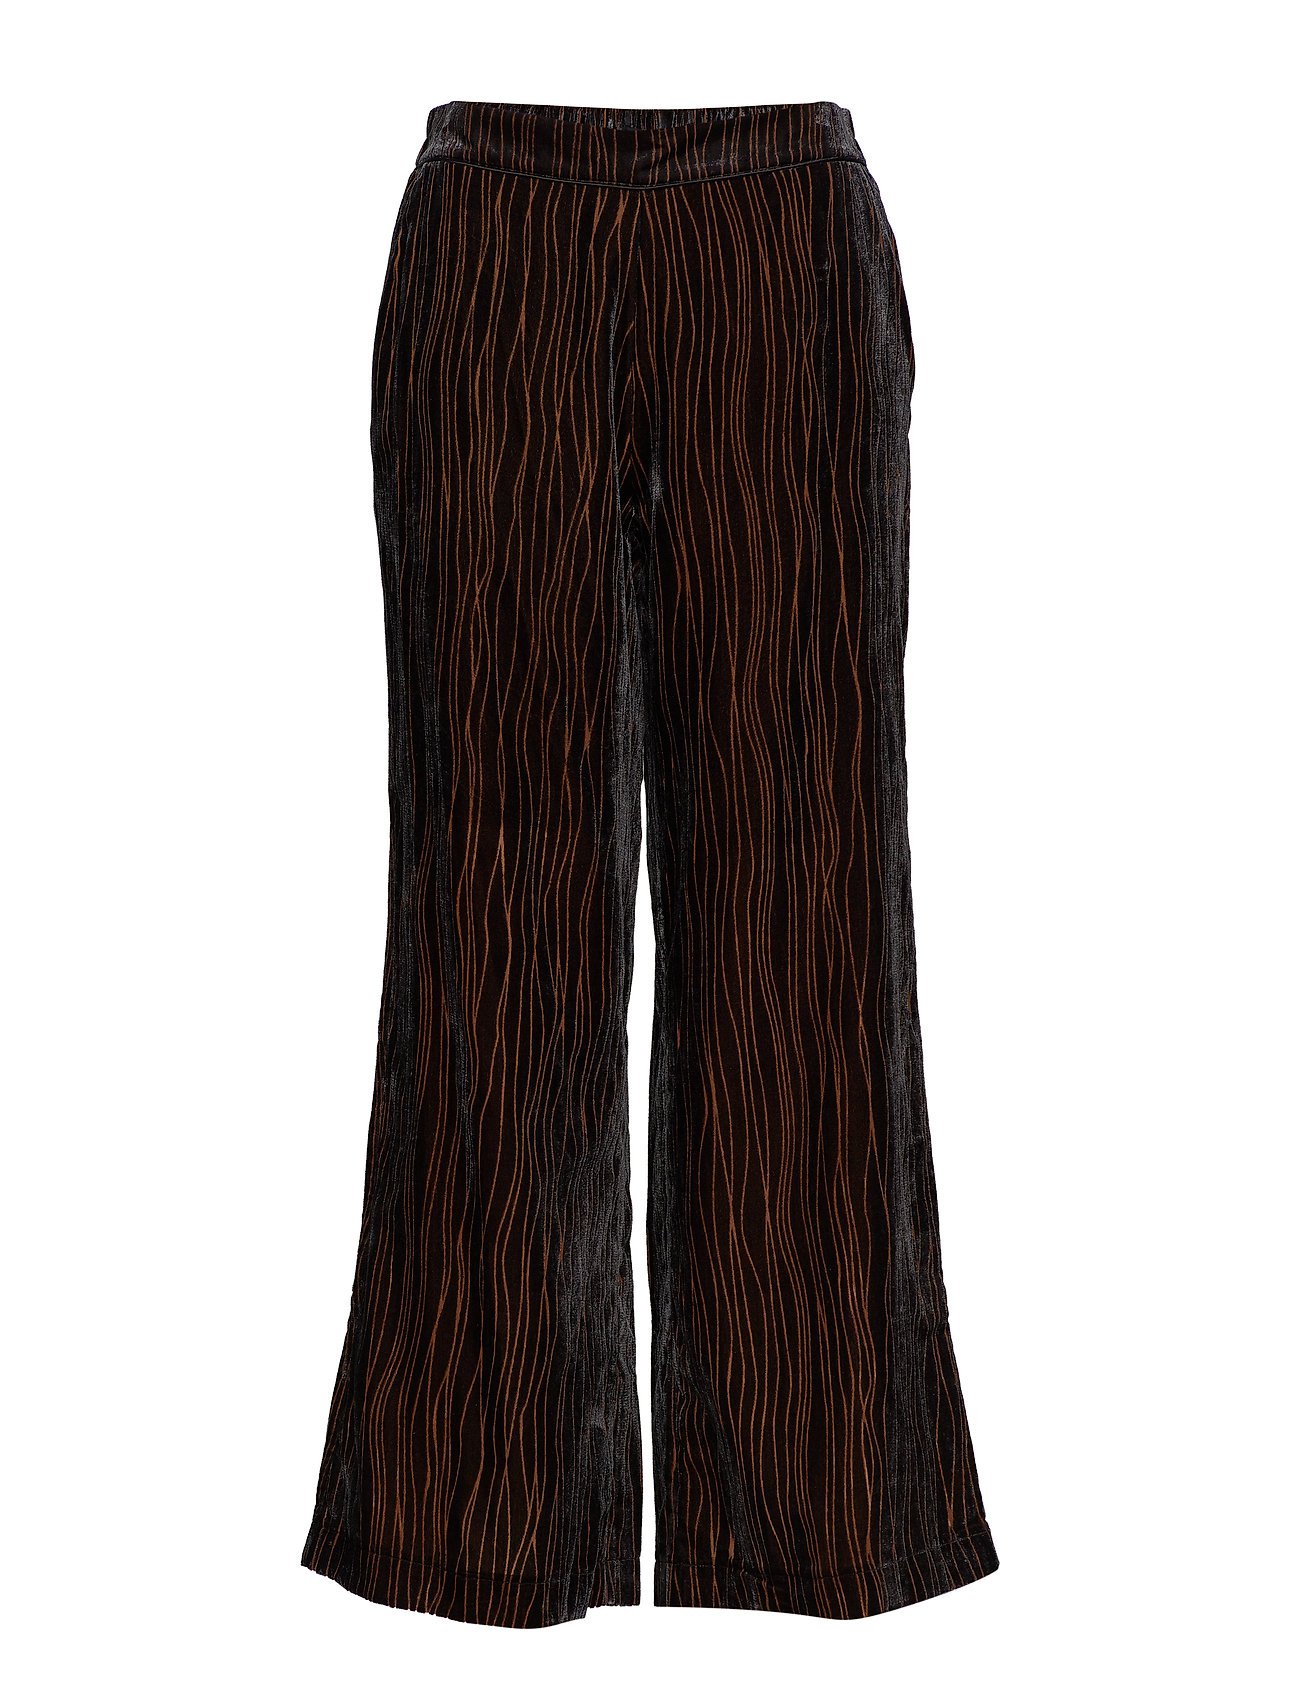 MOS MOSH Rita Velvet Pant - BLACK